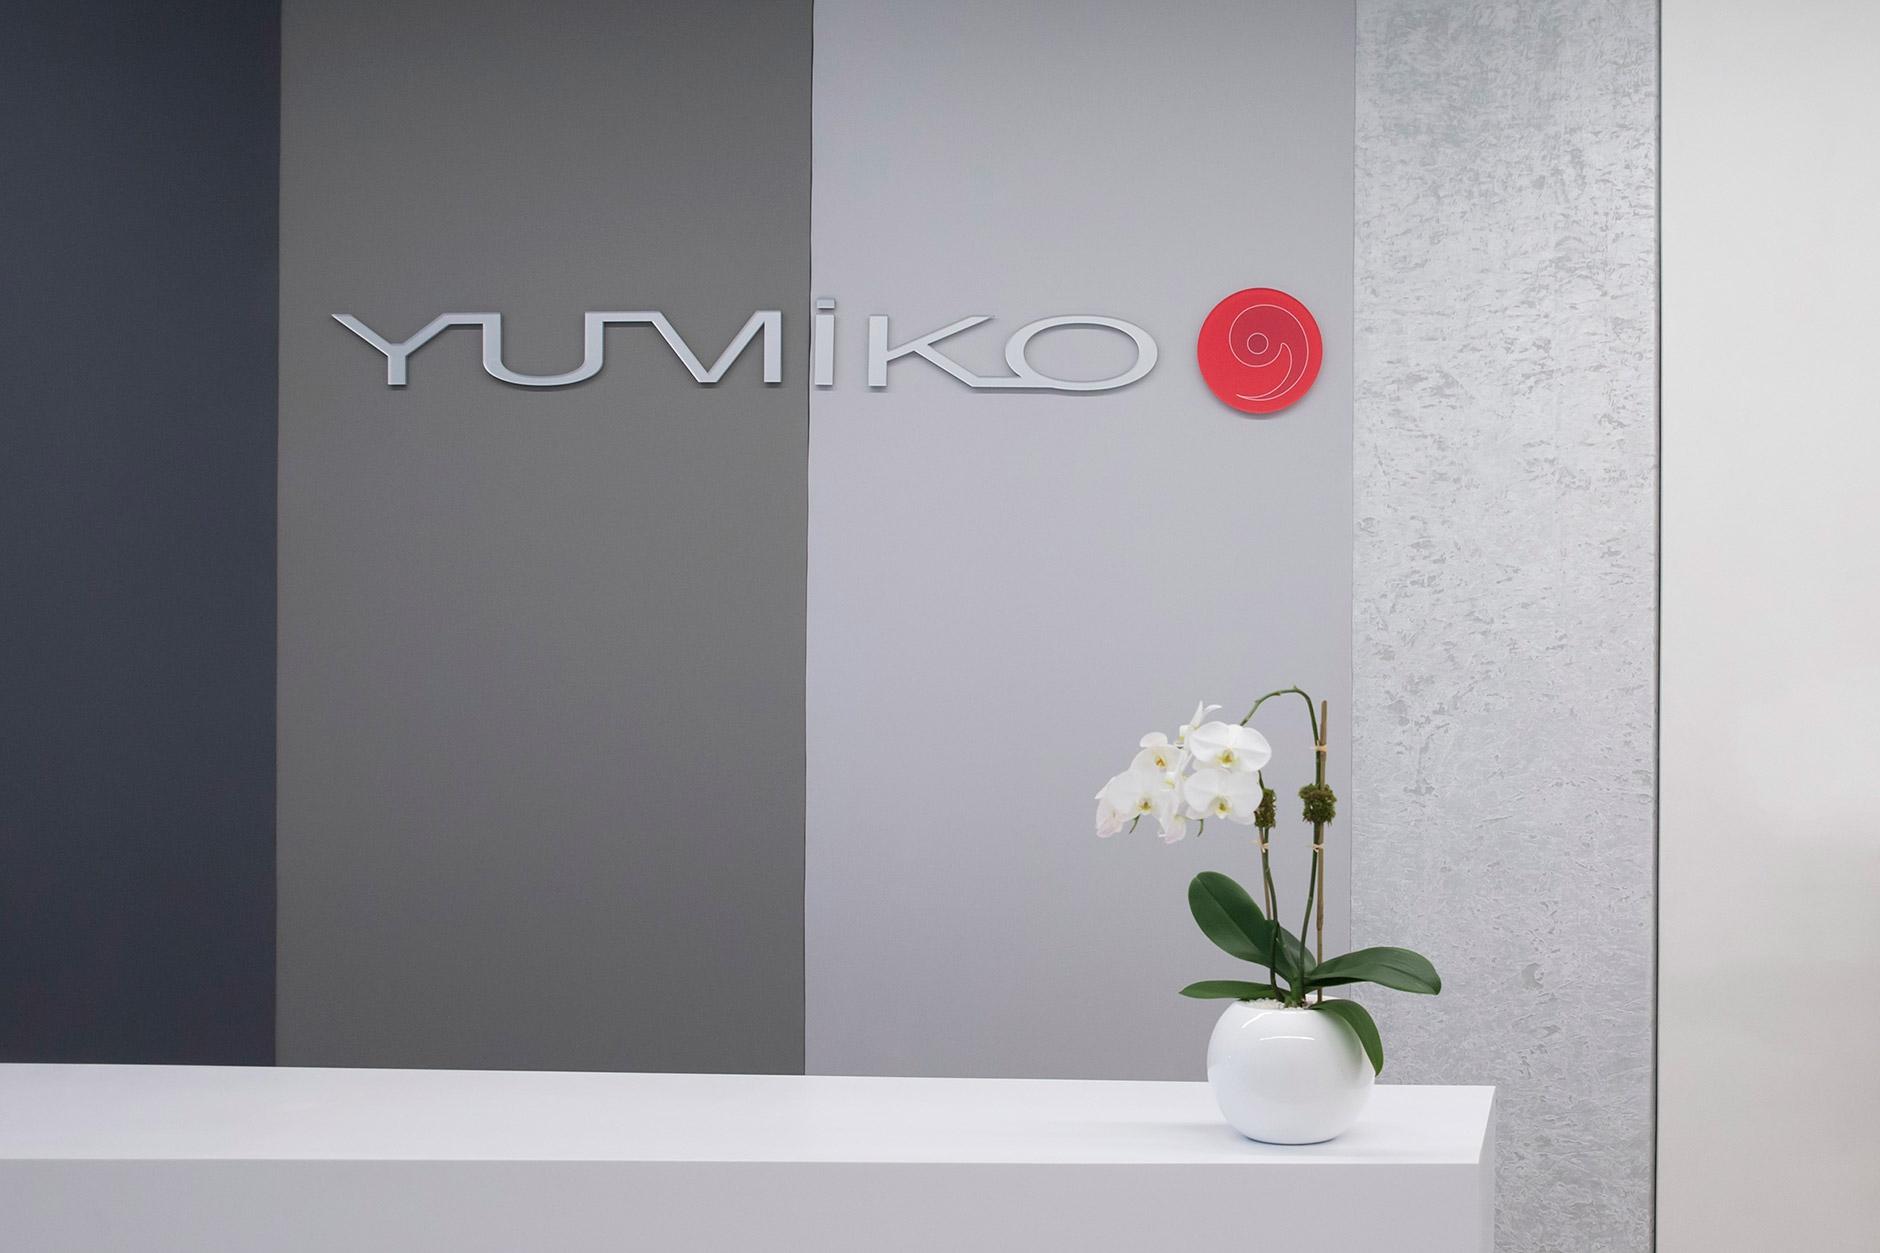 Yumiko New York Boutique Counter